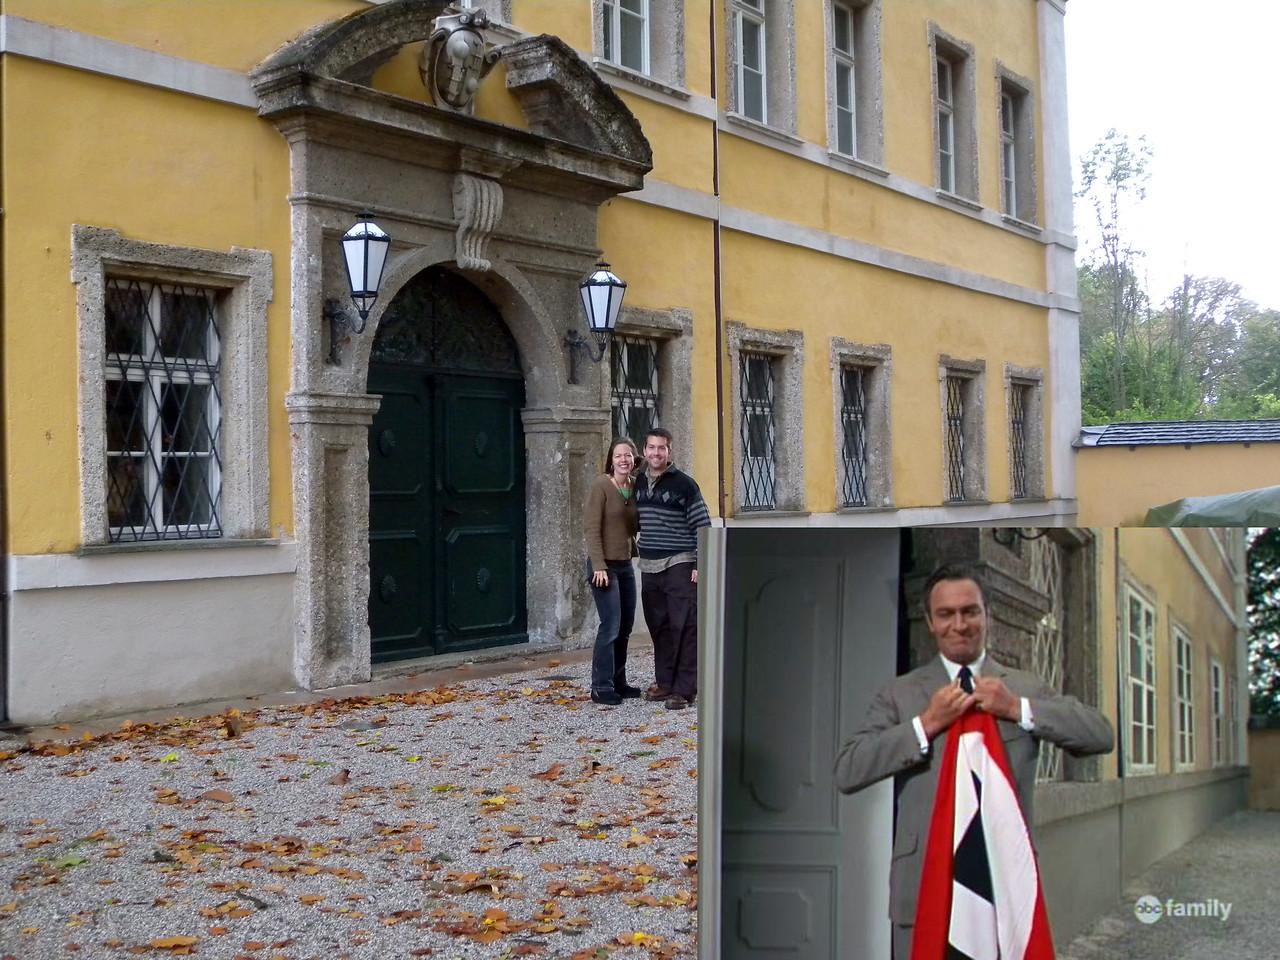 Frohnburg Castle - Front door. I love the scene where the Captain tears down the Nazi flag.